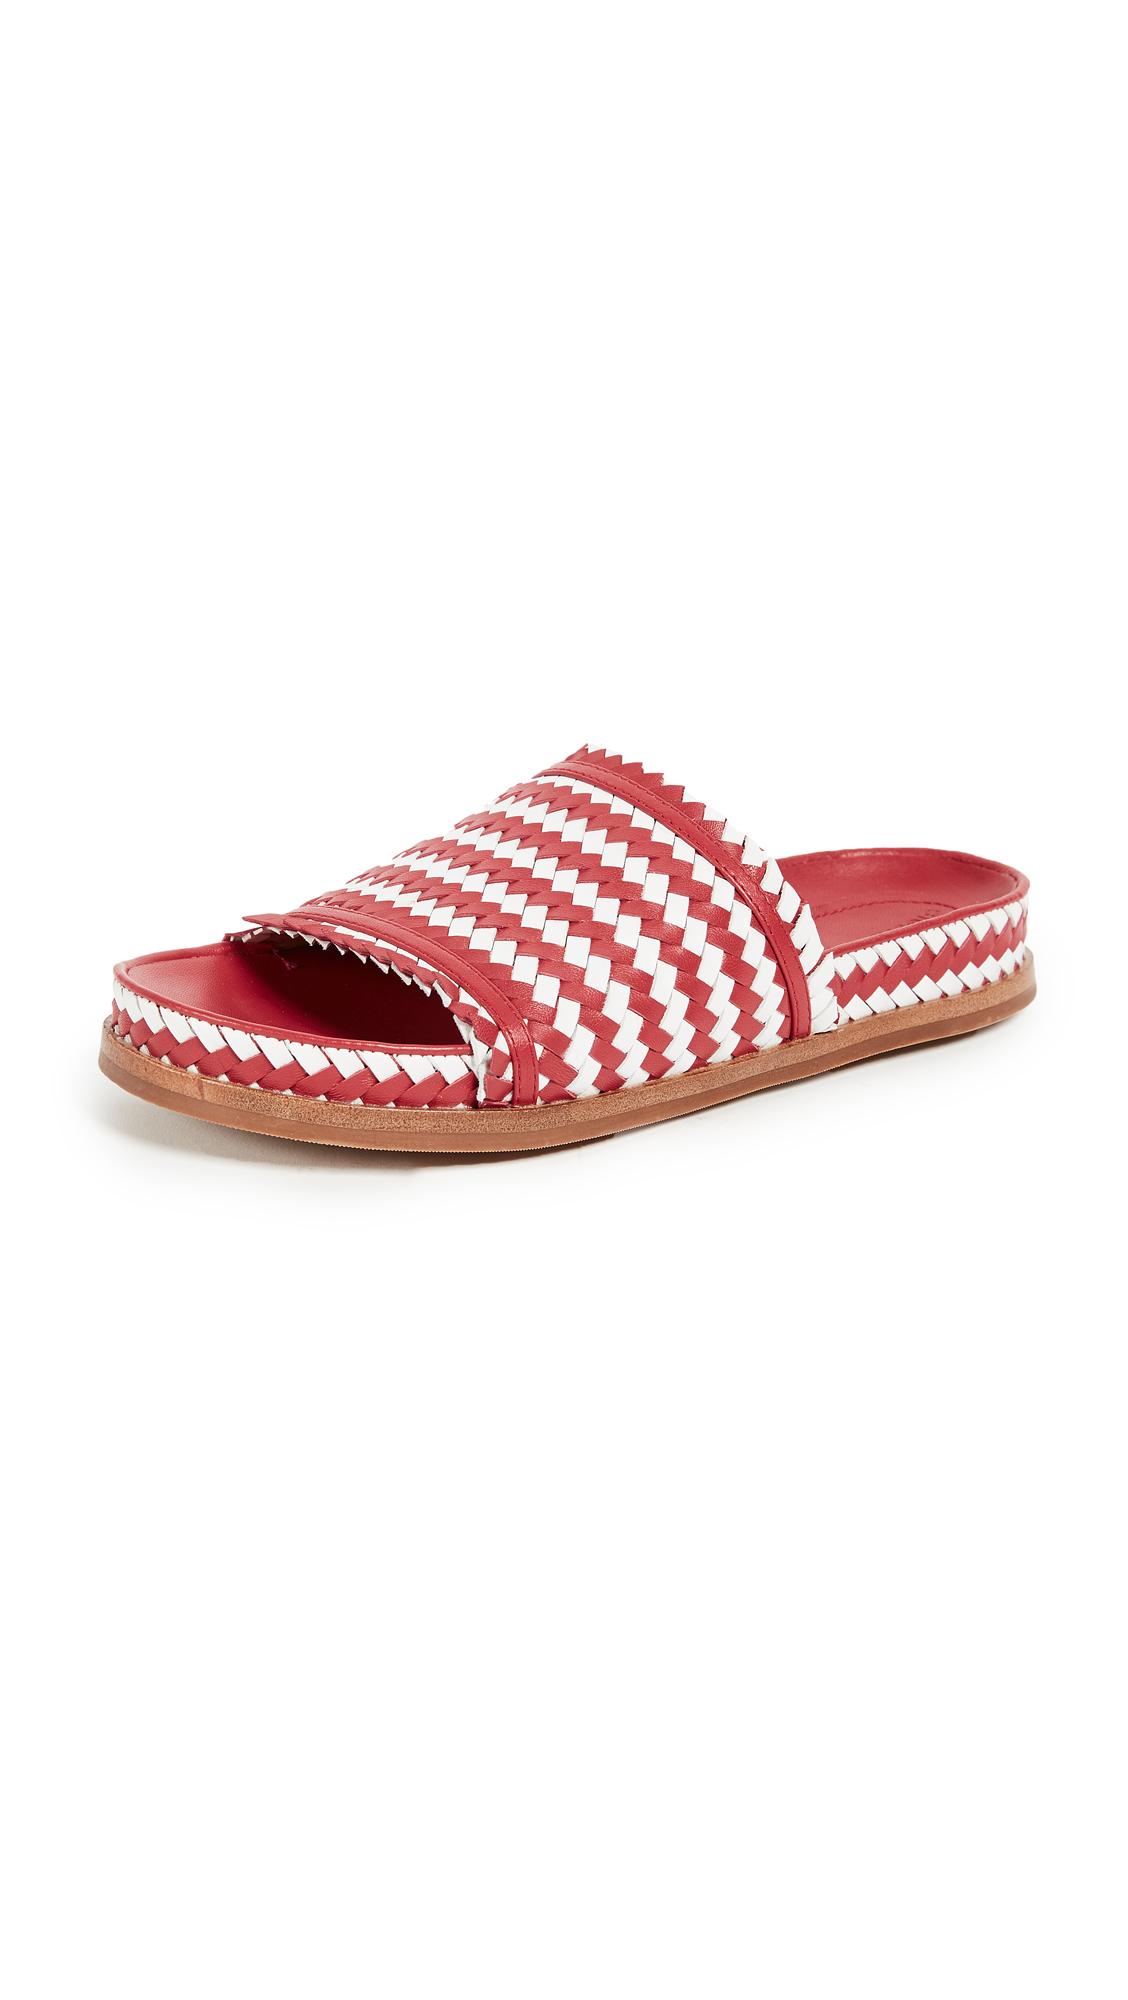 Sigerson Morrison Aoven Woven Sandals - Crimson/White